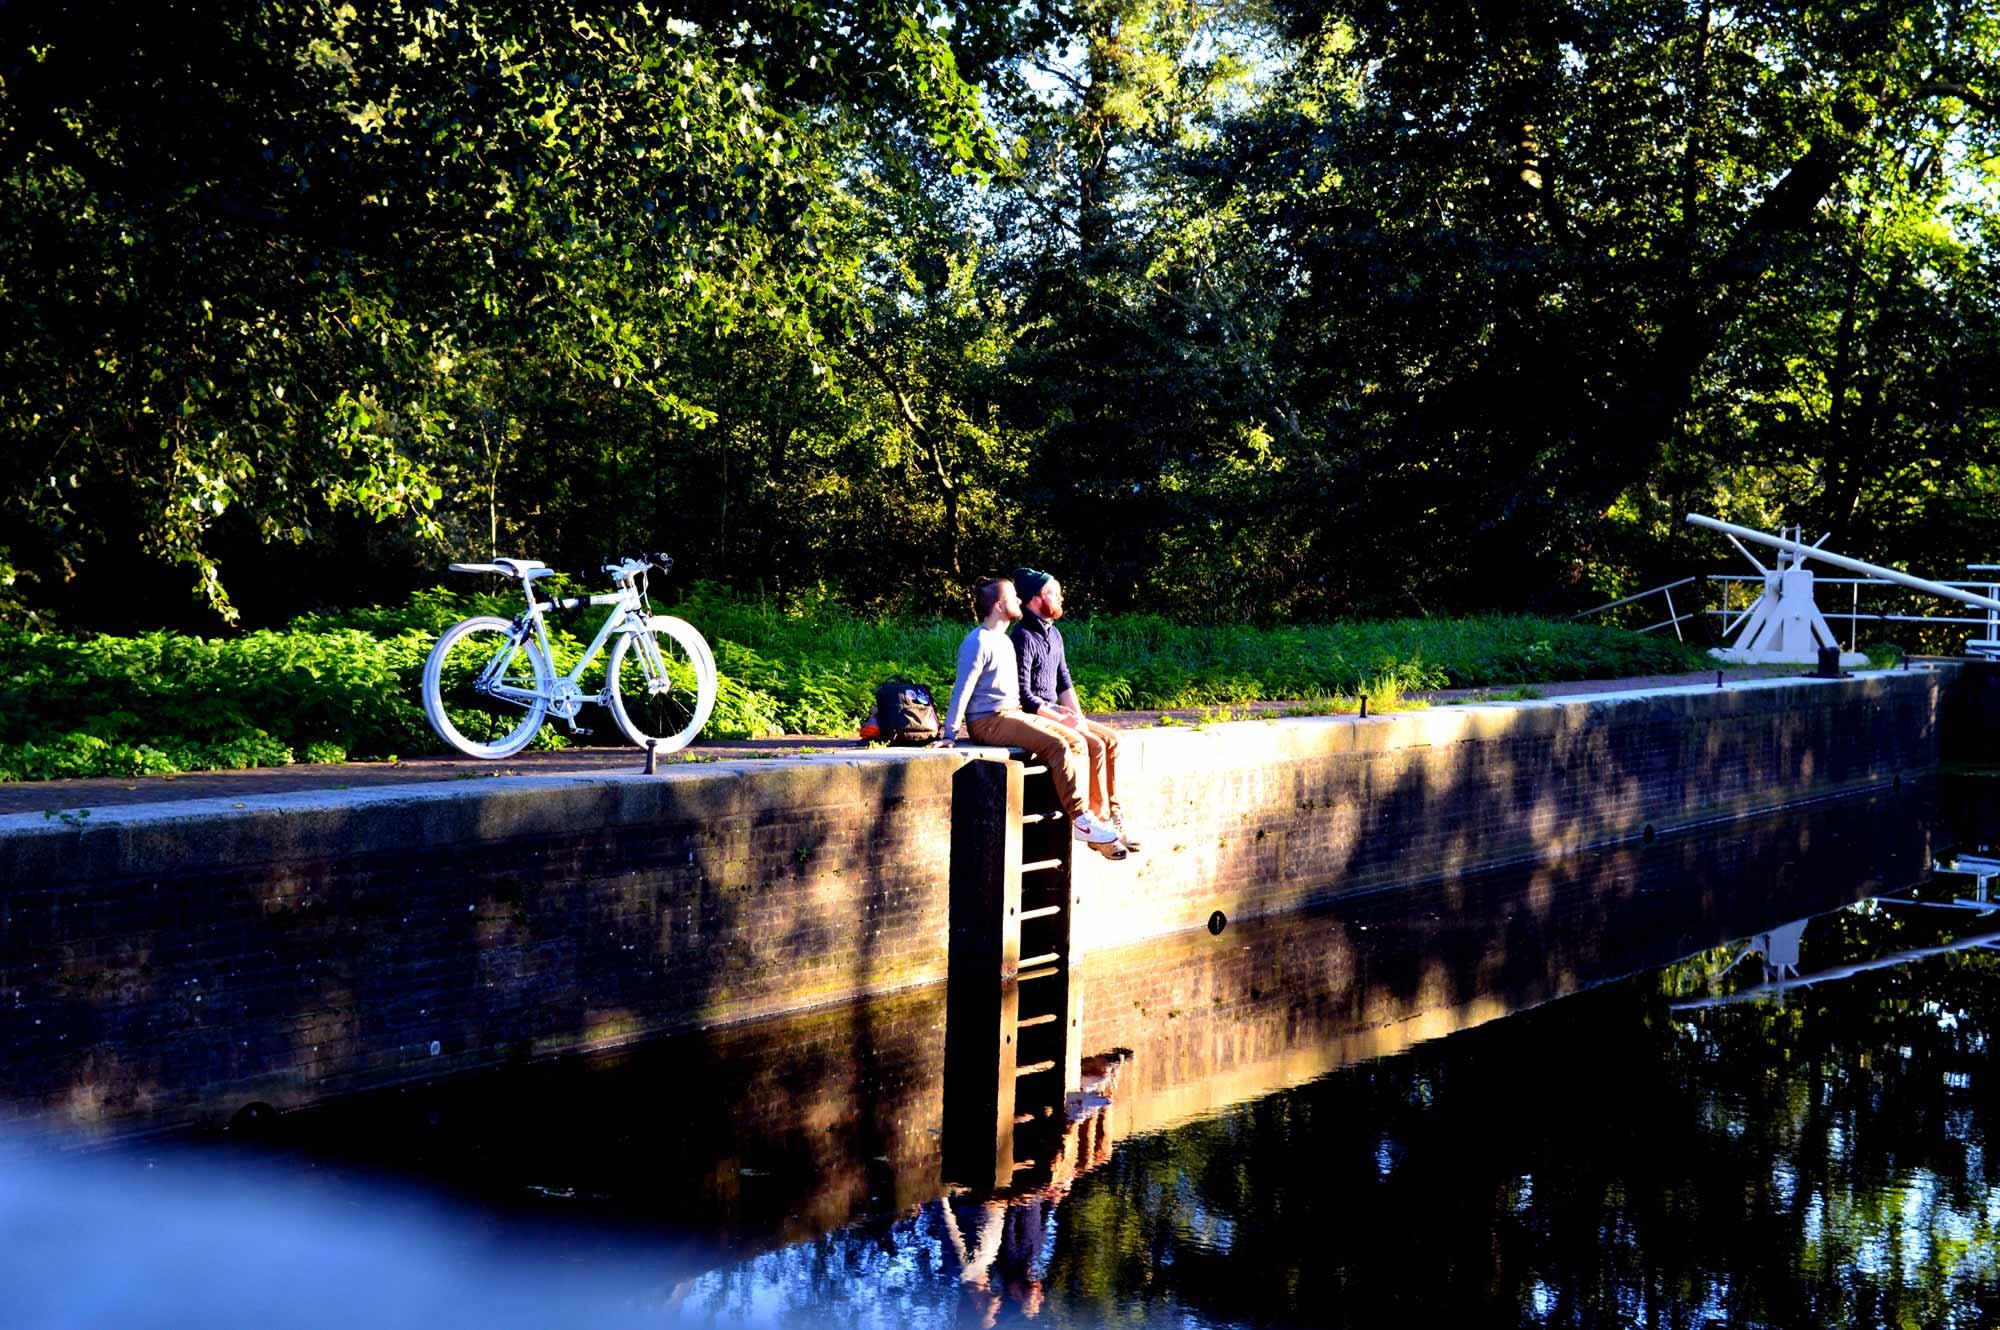 Gay Couple Biking Trips Amsterdam Forest © CoupleofMen.com